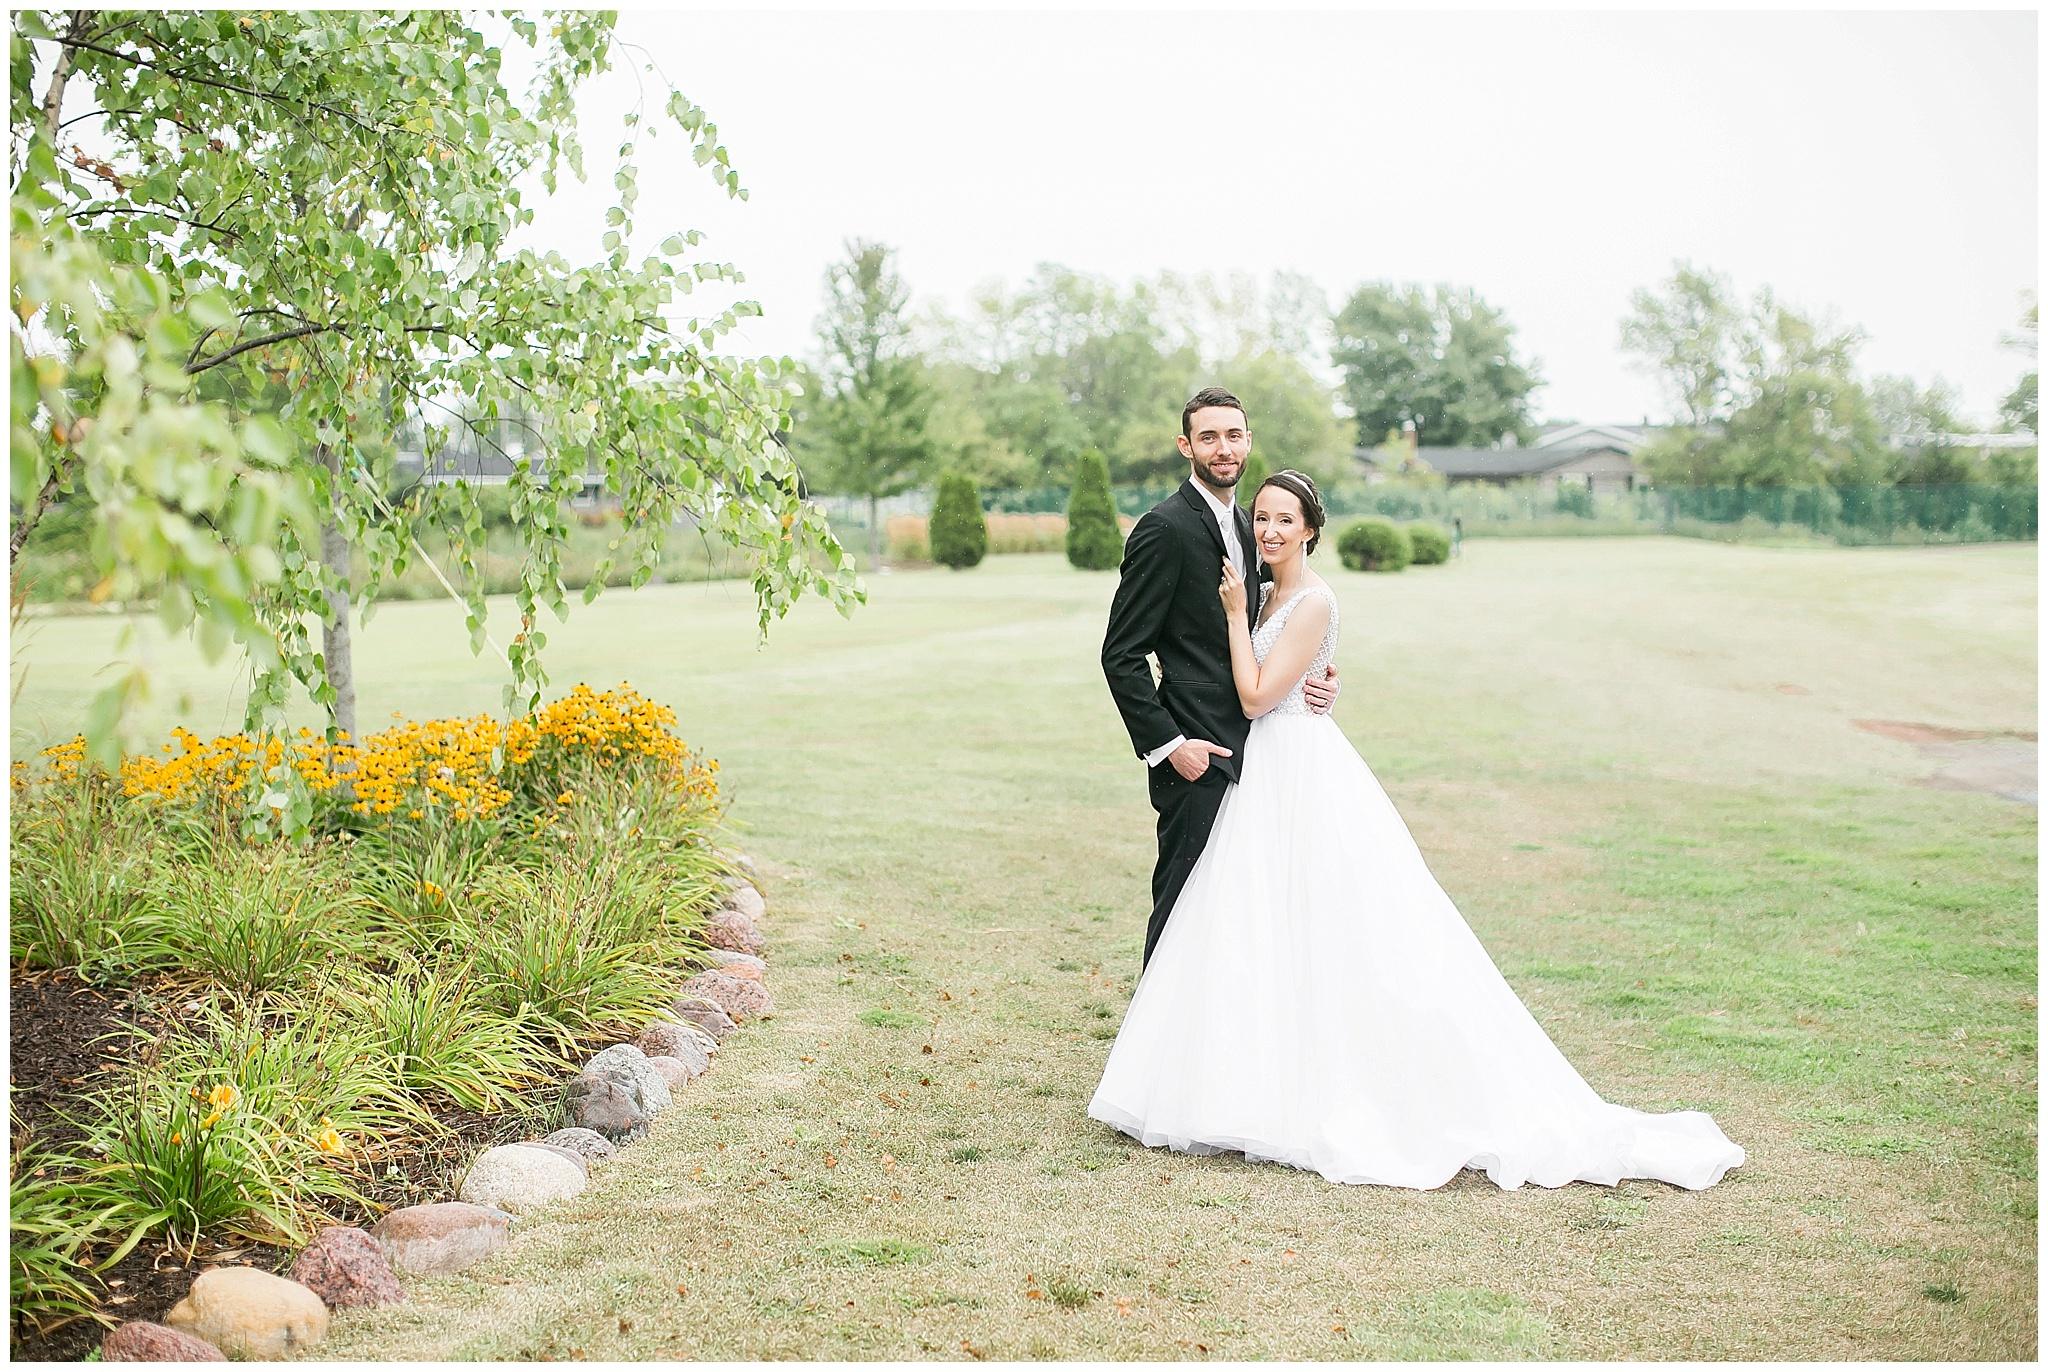 bridgewood_resort_wedding_neenah_wisconsin_0339.jpg